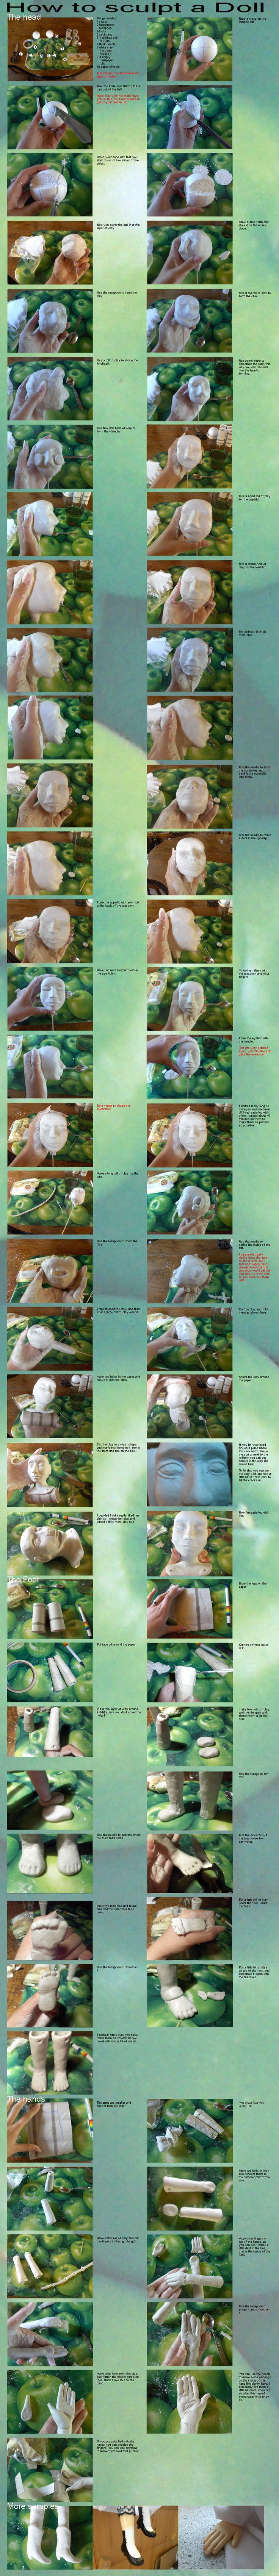 How to sculpt a doll-tutorial- by Hamkaastostie